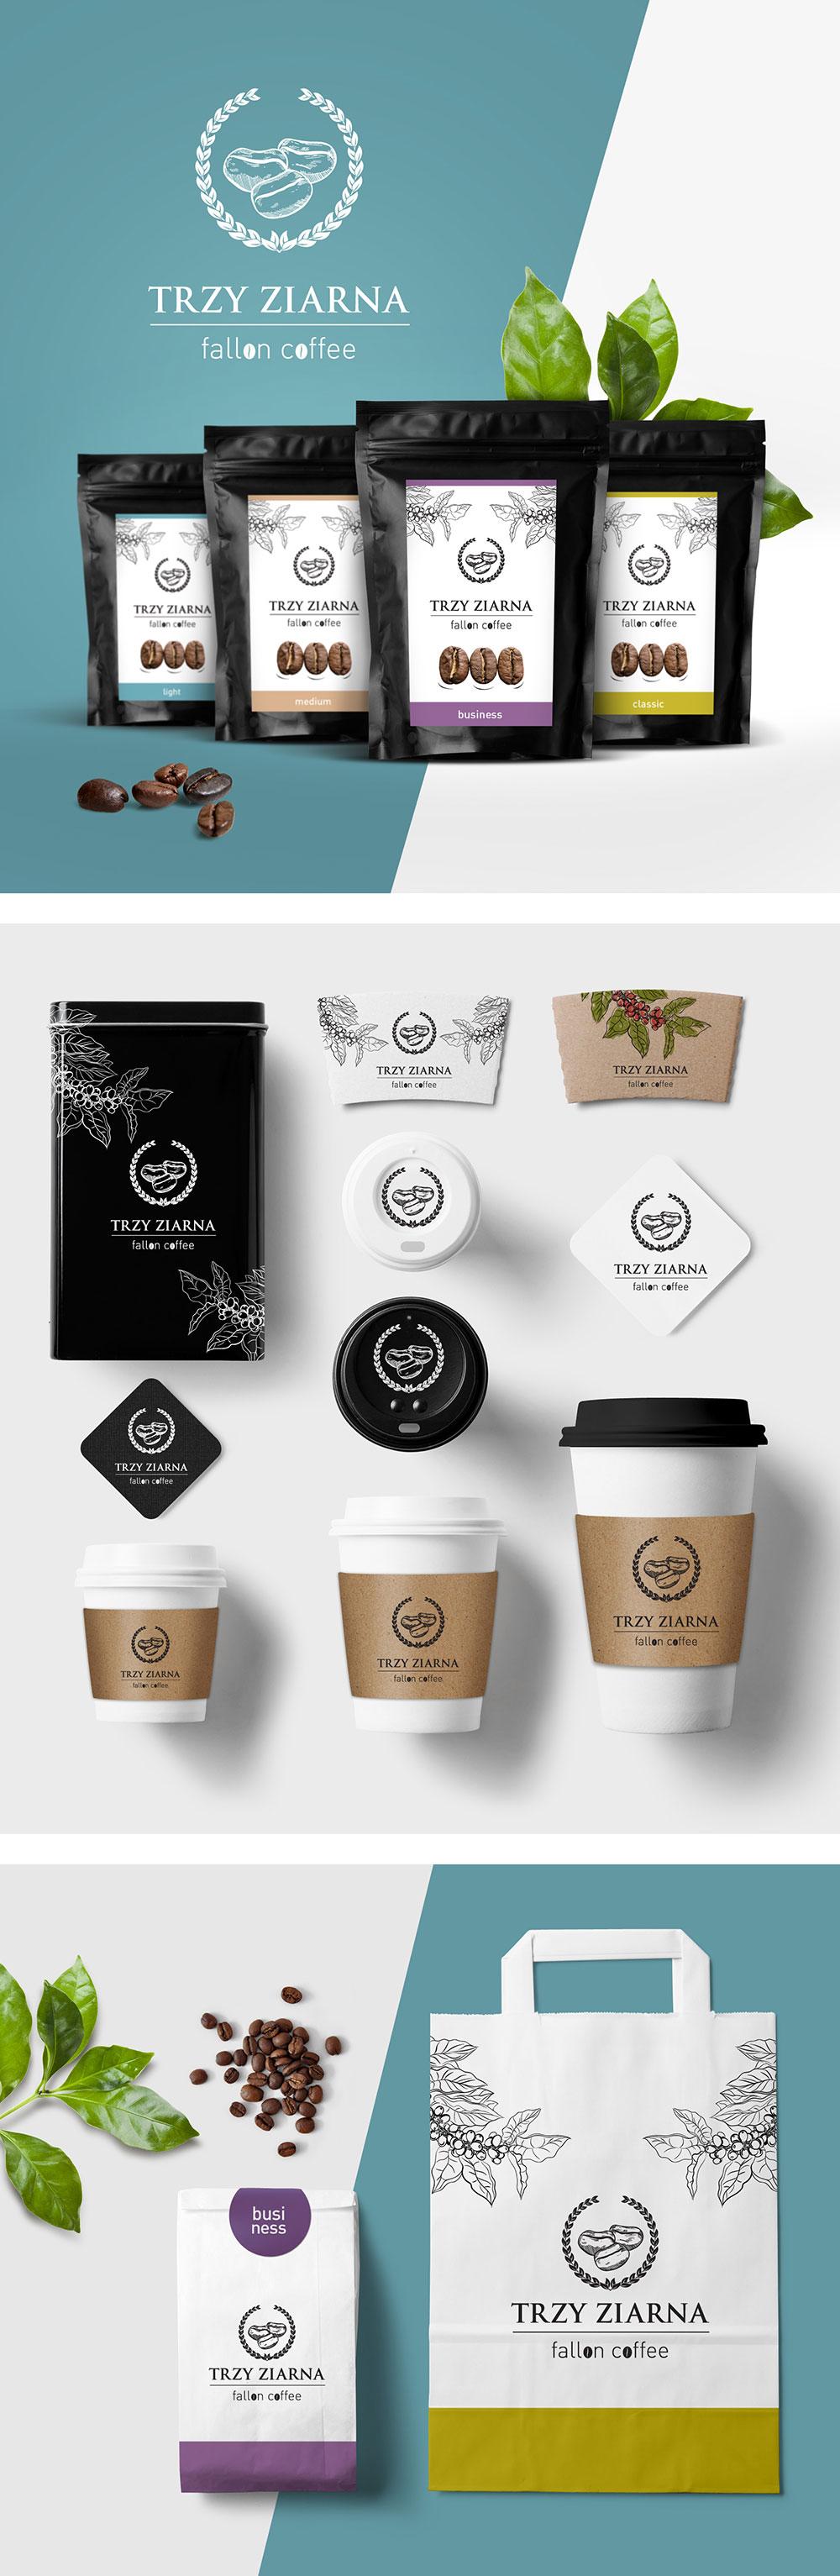 packaging_fallon_coffee